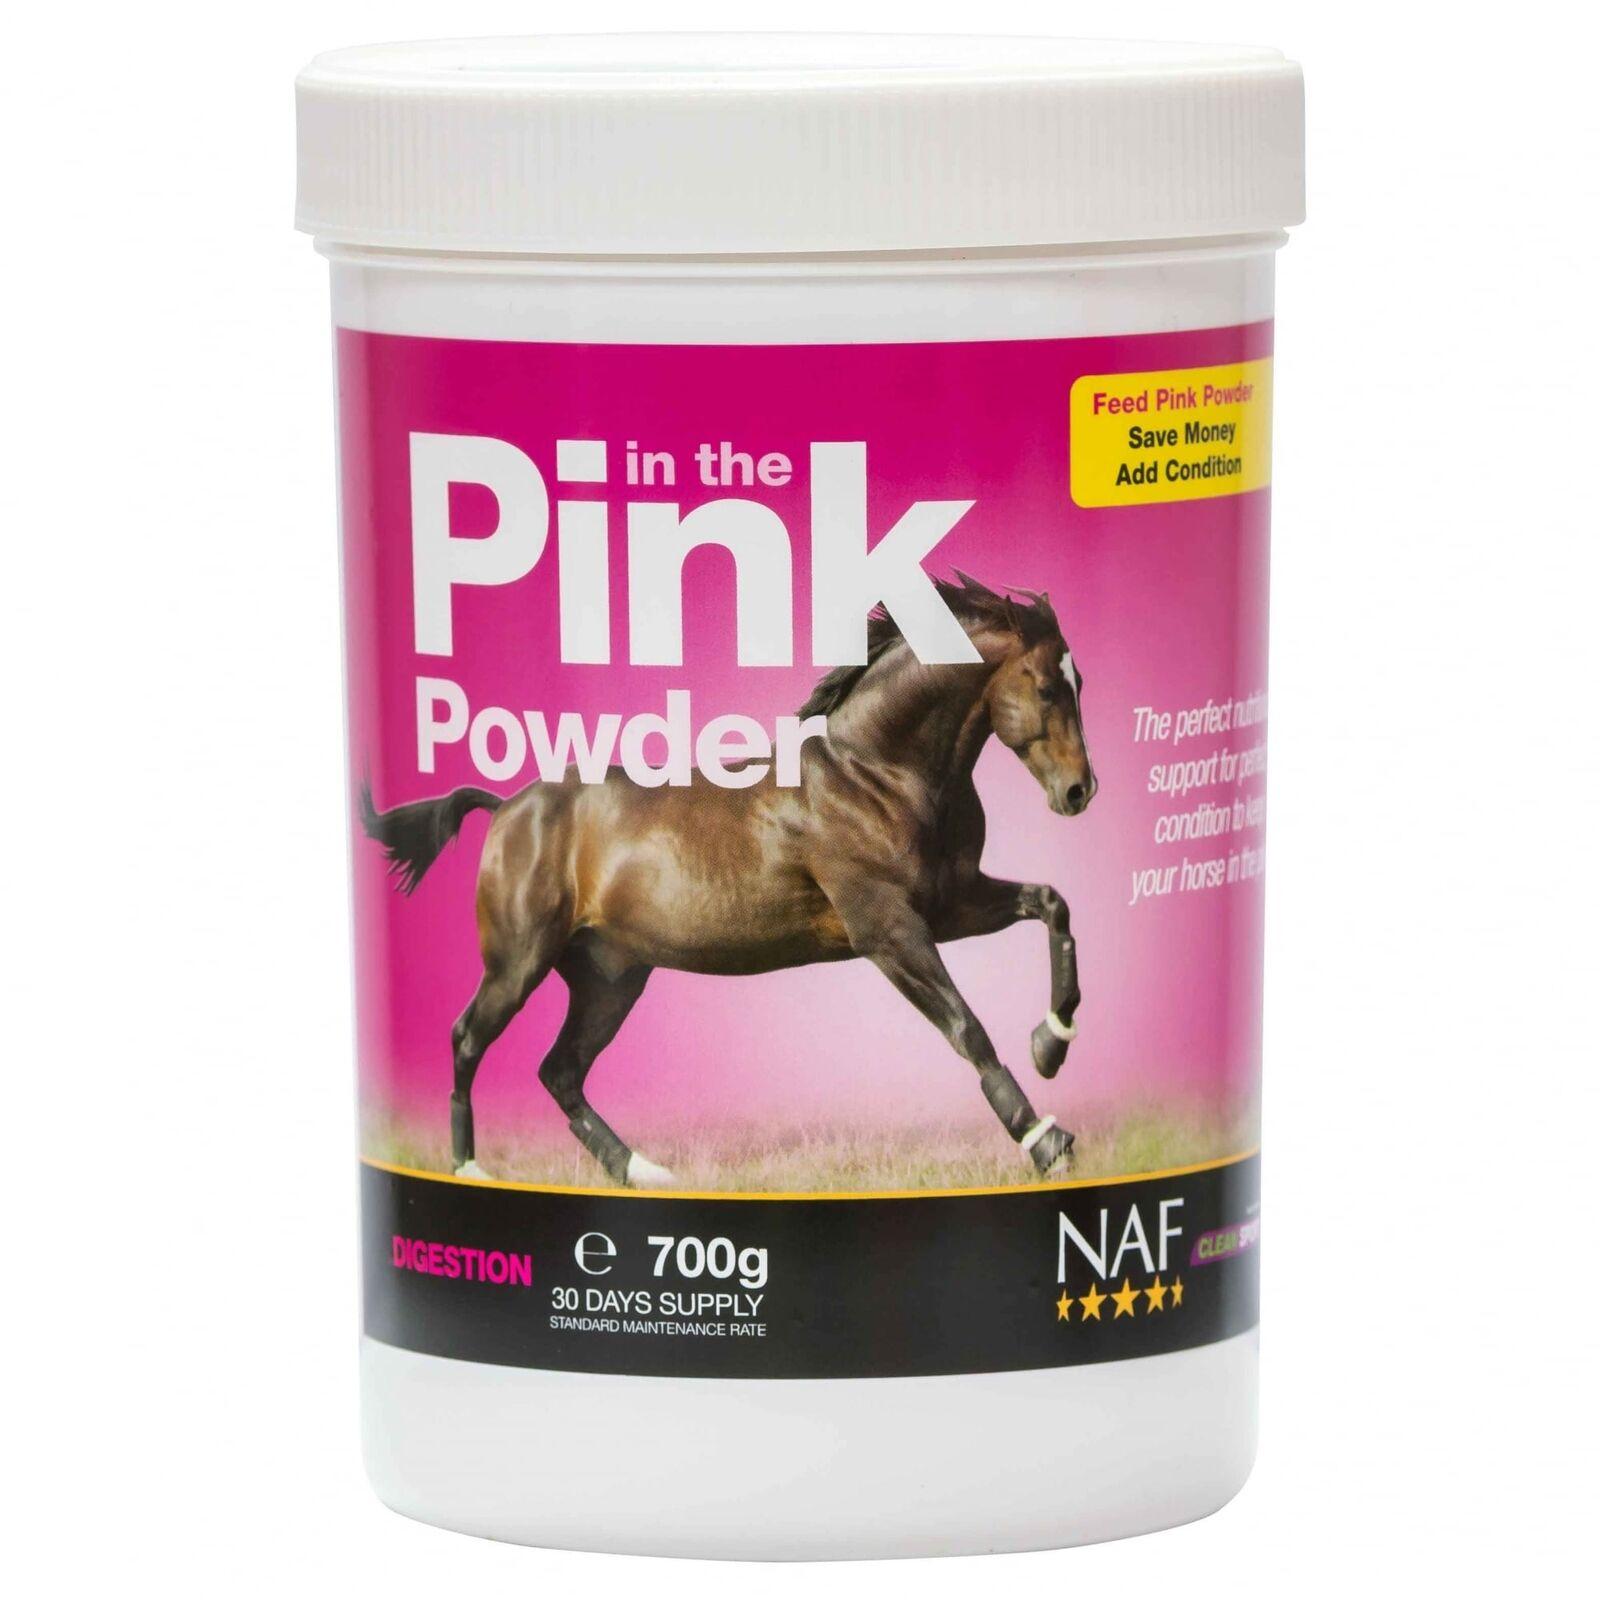 NAF Pink Powder - Horse Supplement